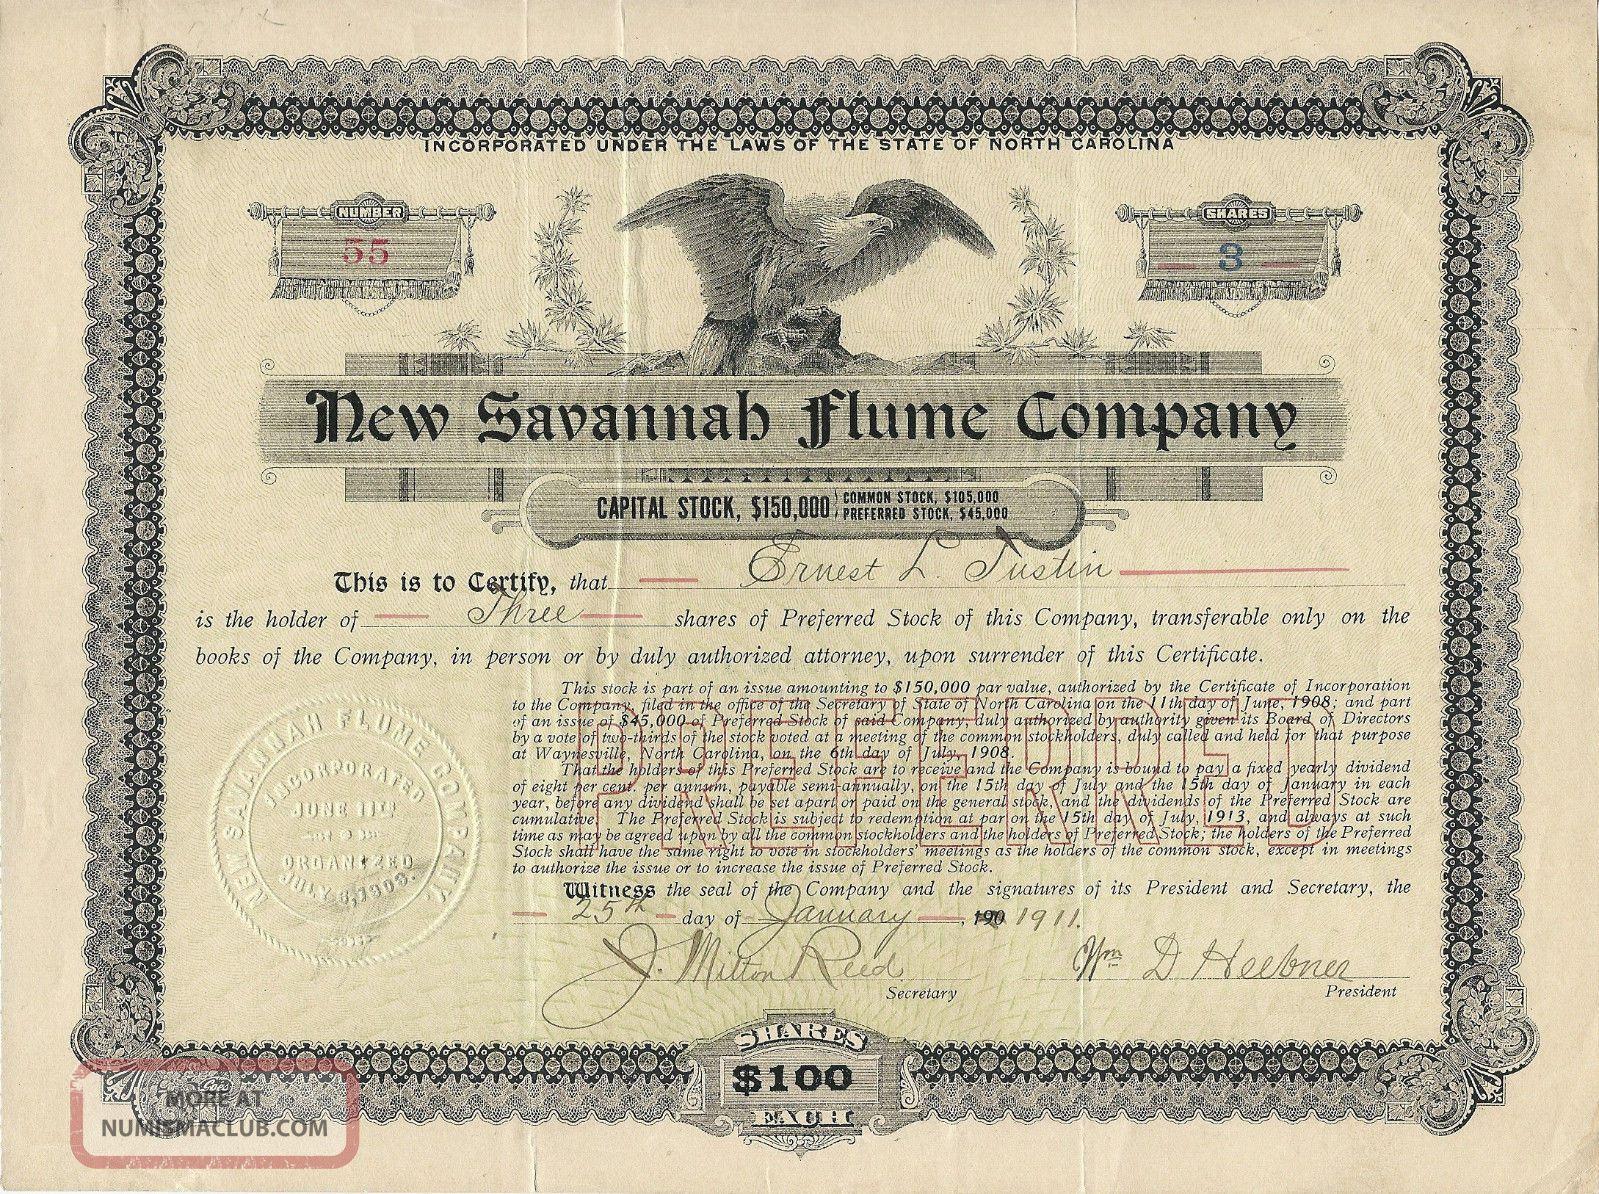 North Carolina,  Savannah Flume Company Stock Certificate 1911 Stocks & Bonds, Scripophily photo